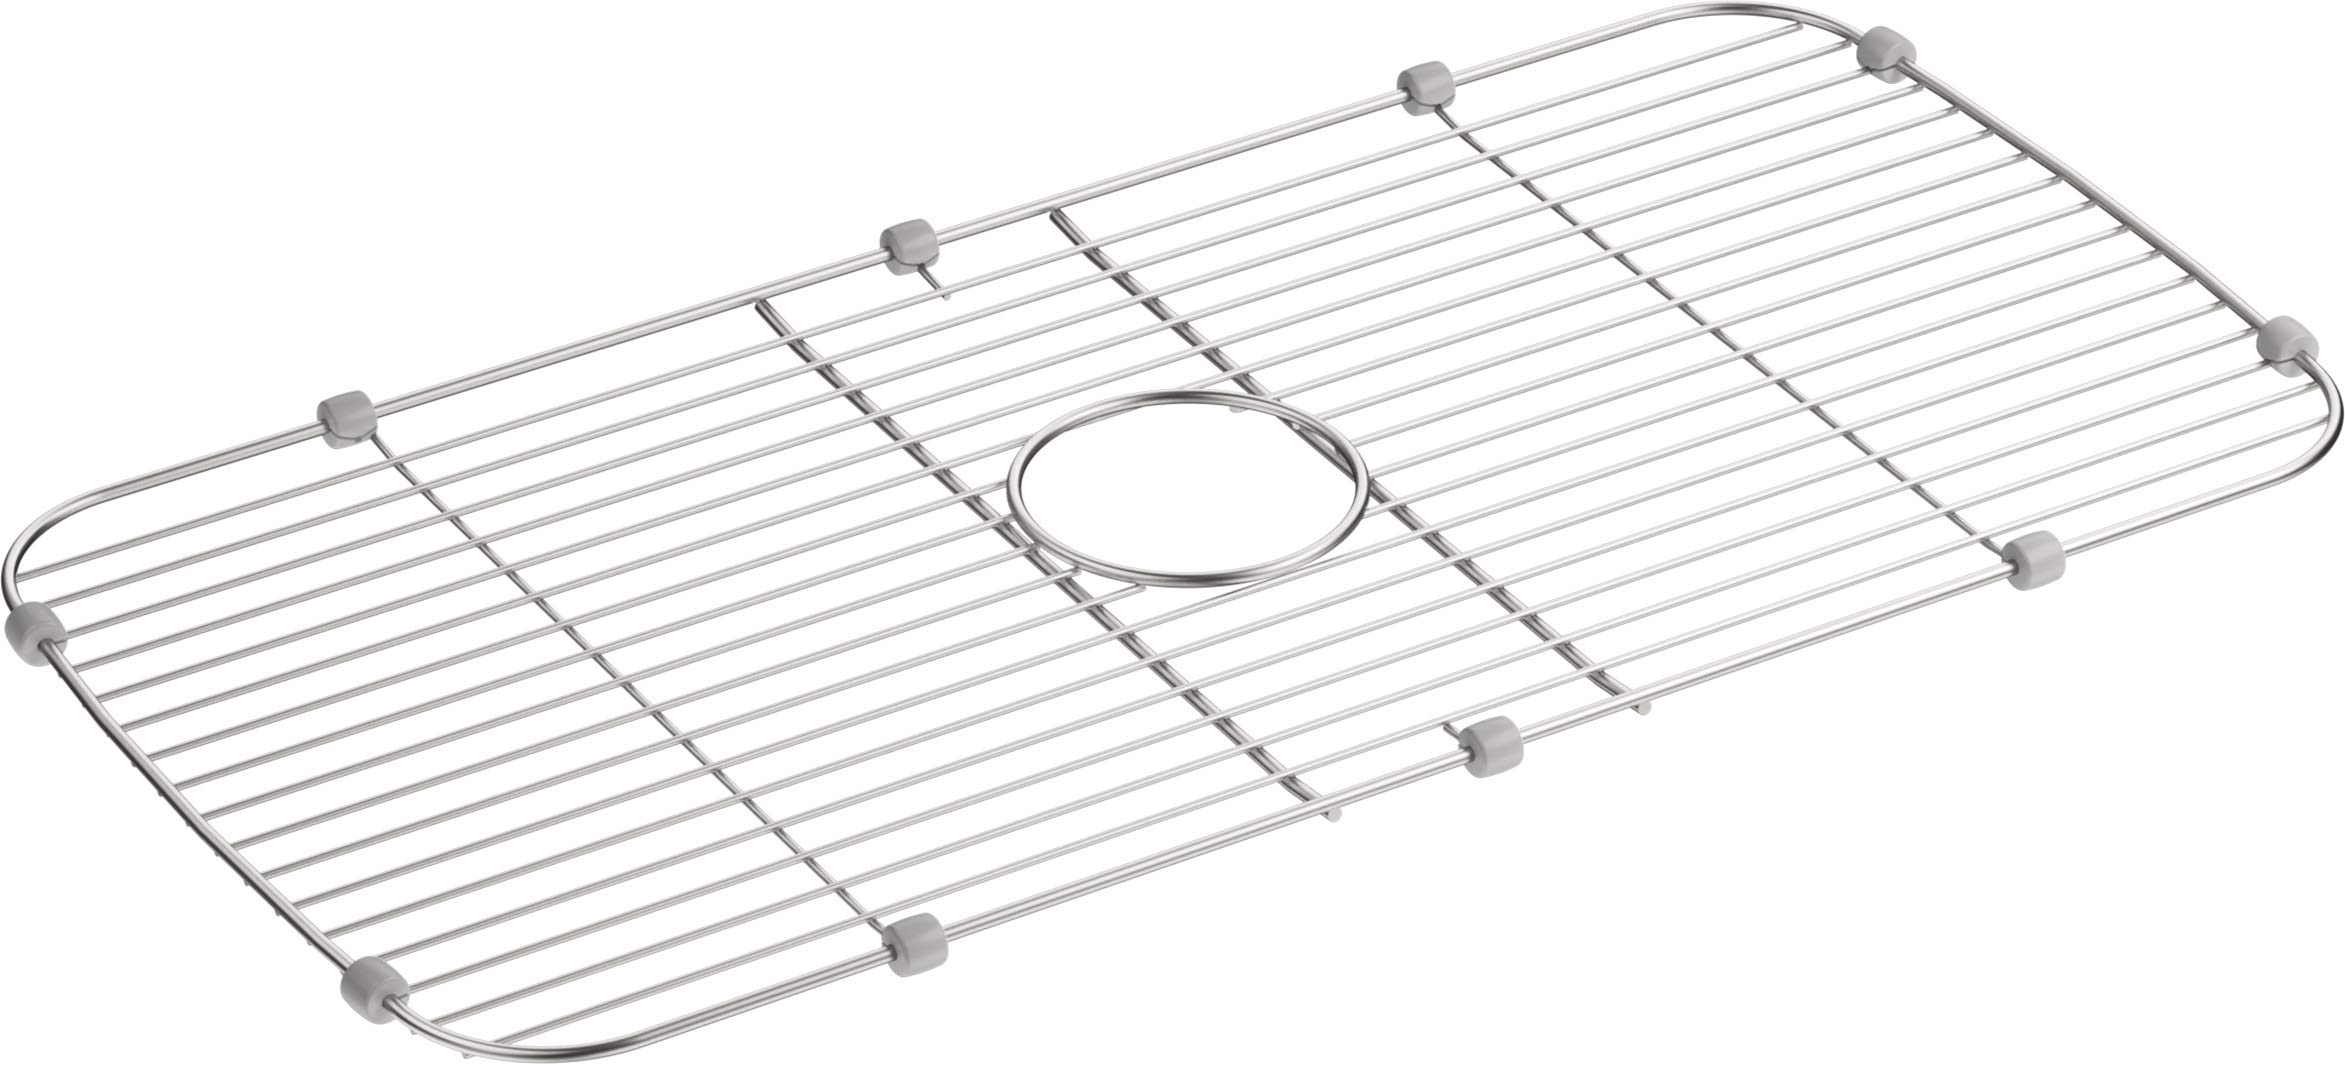 KOHLER 11459-ST Verse Sink Rack Stainless Steel